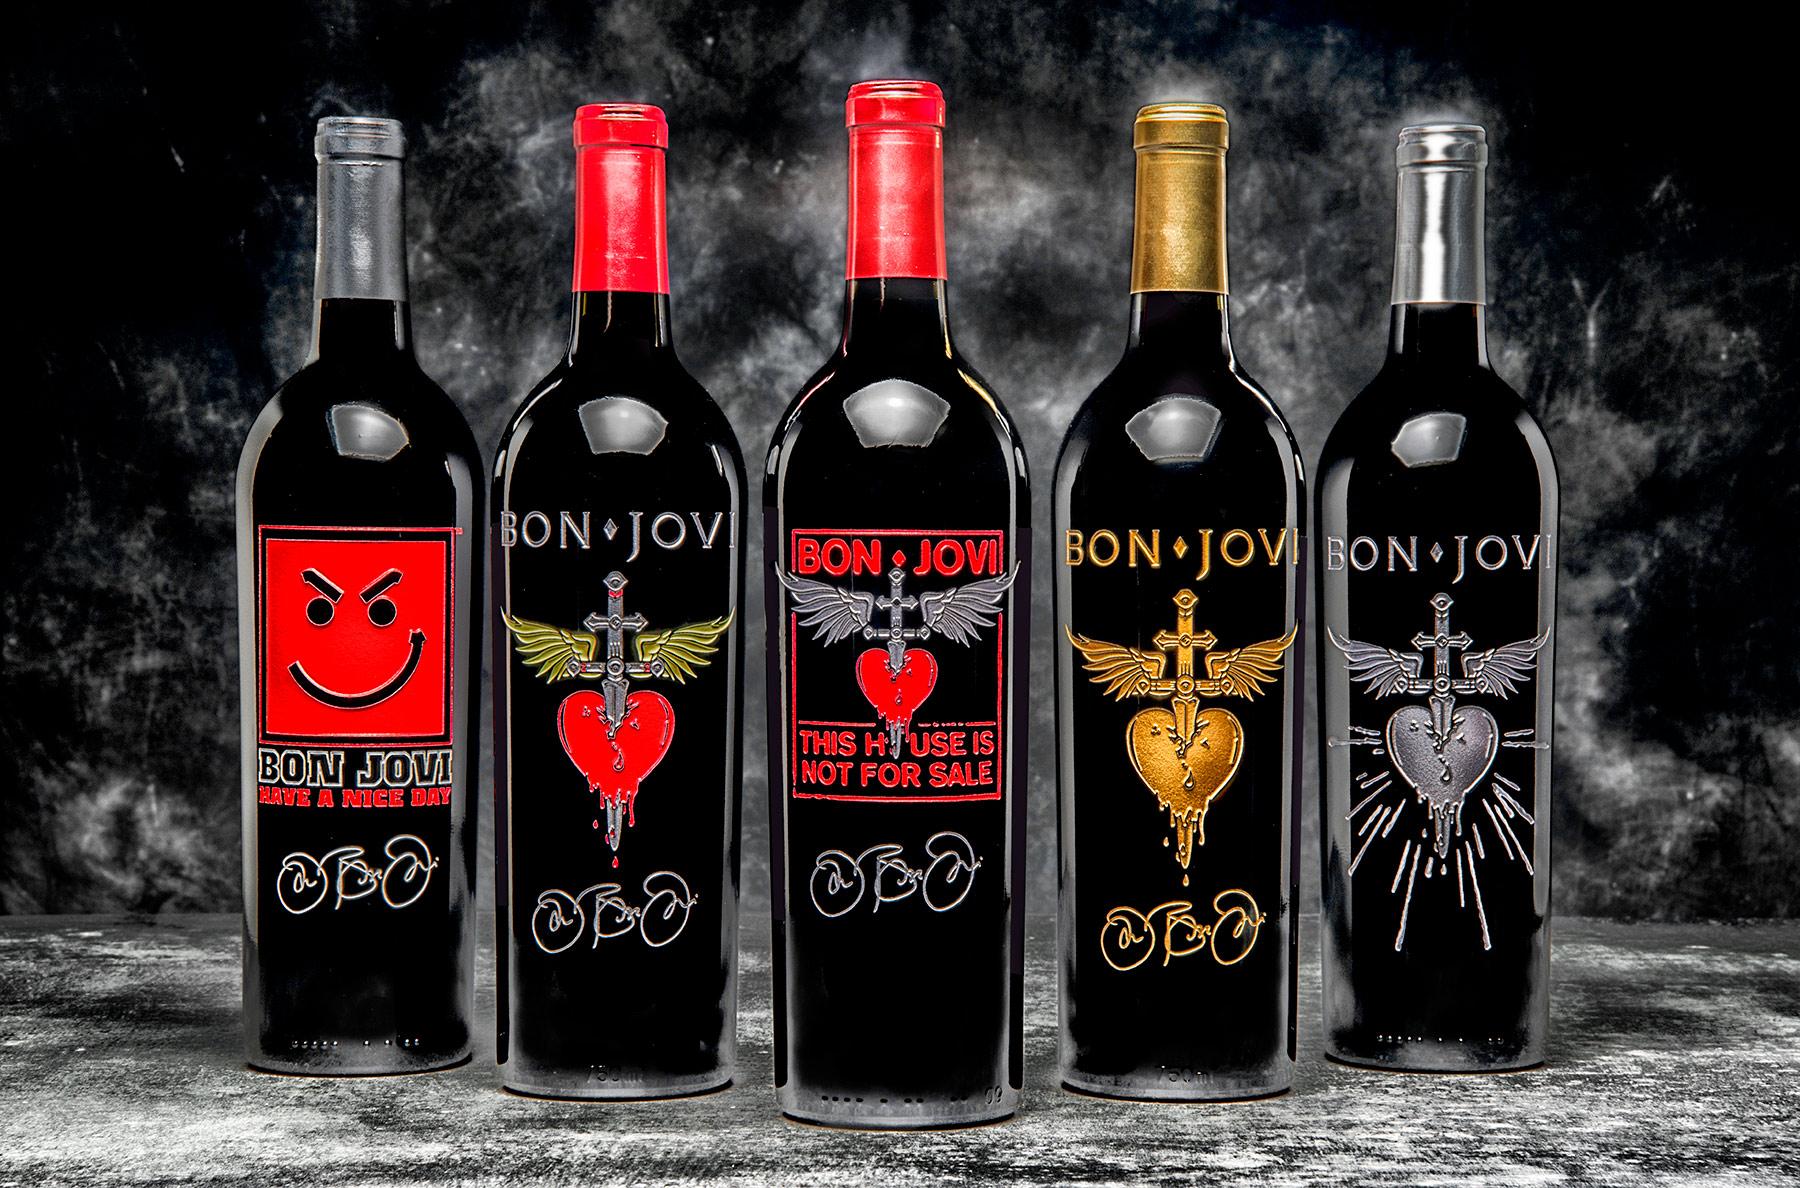 Bon-Jovi-etched-bottles-Carl-Kravats-Photography